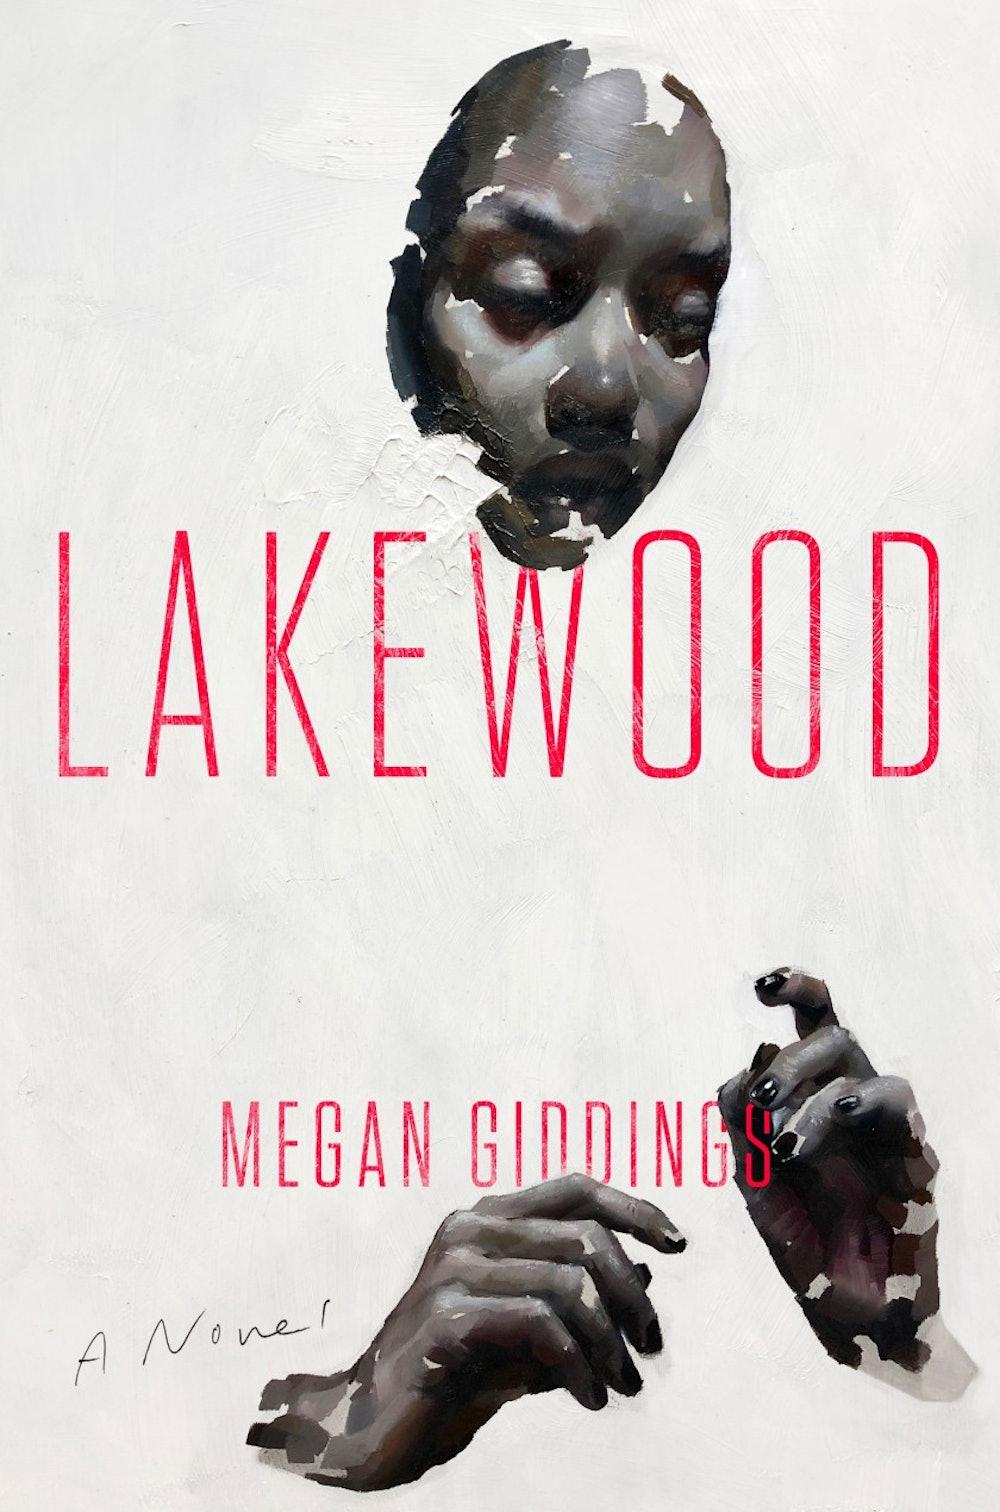 """Lakewood"" by Megan Giddings"